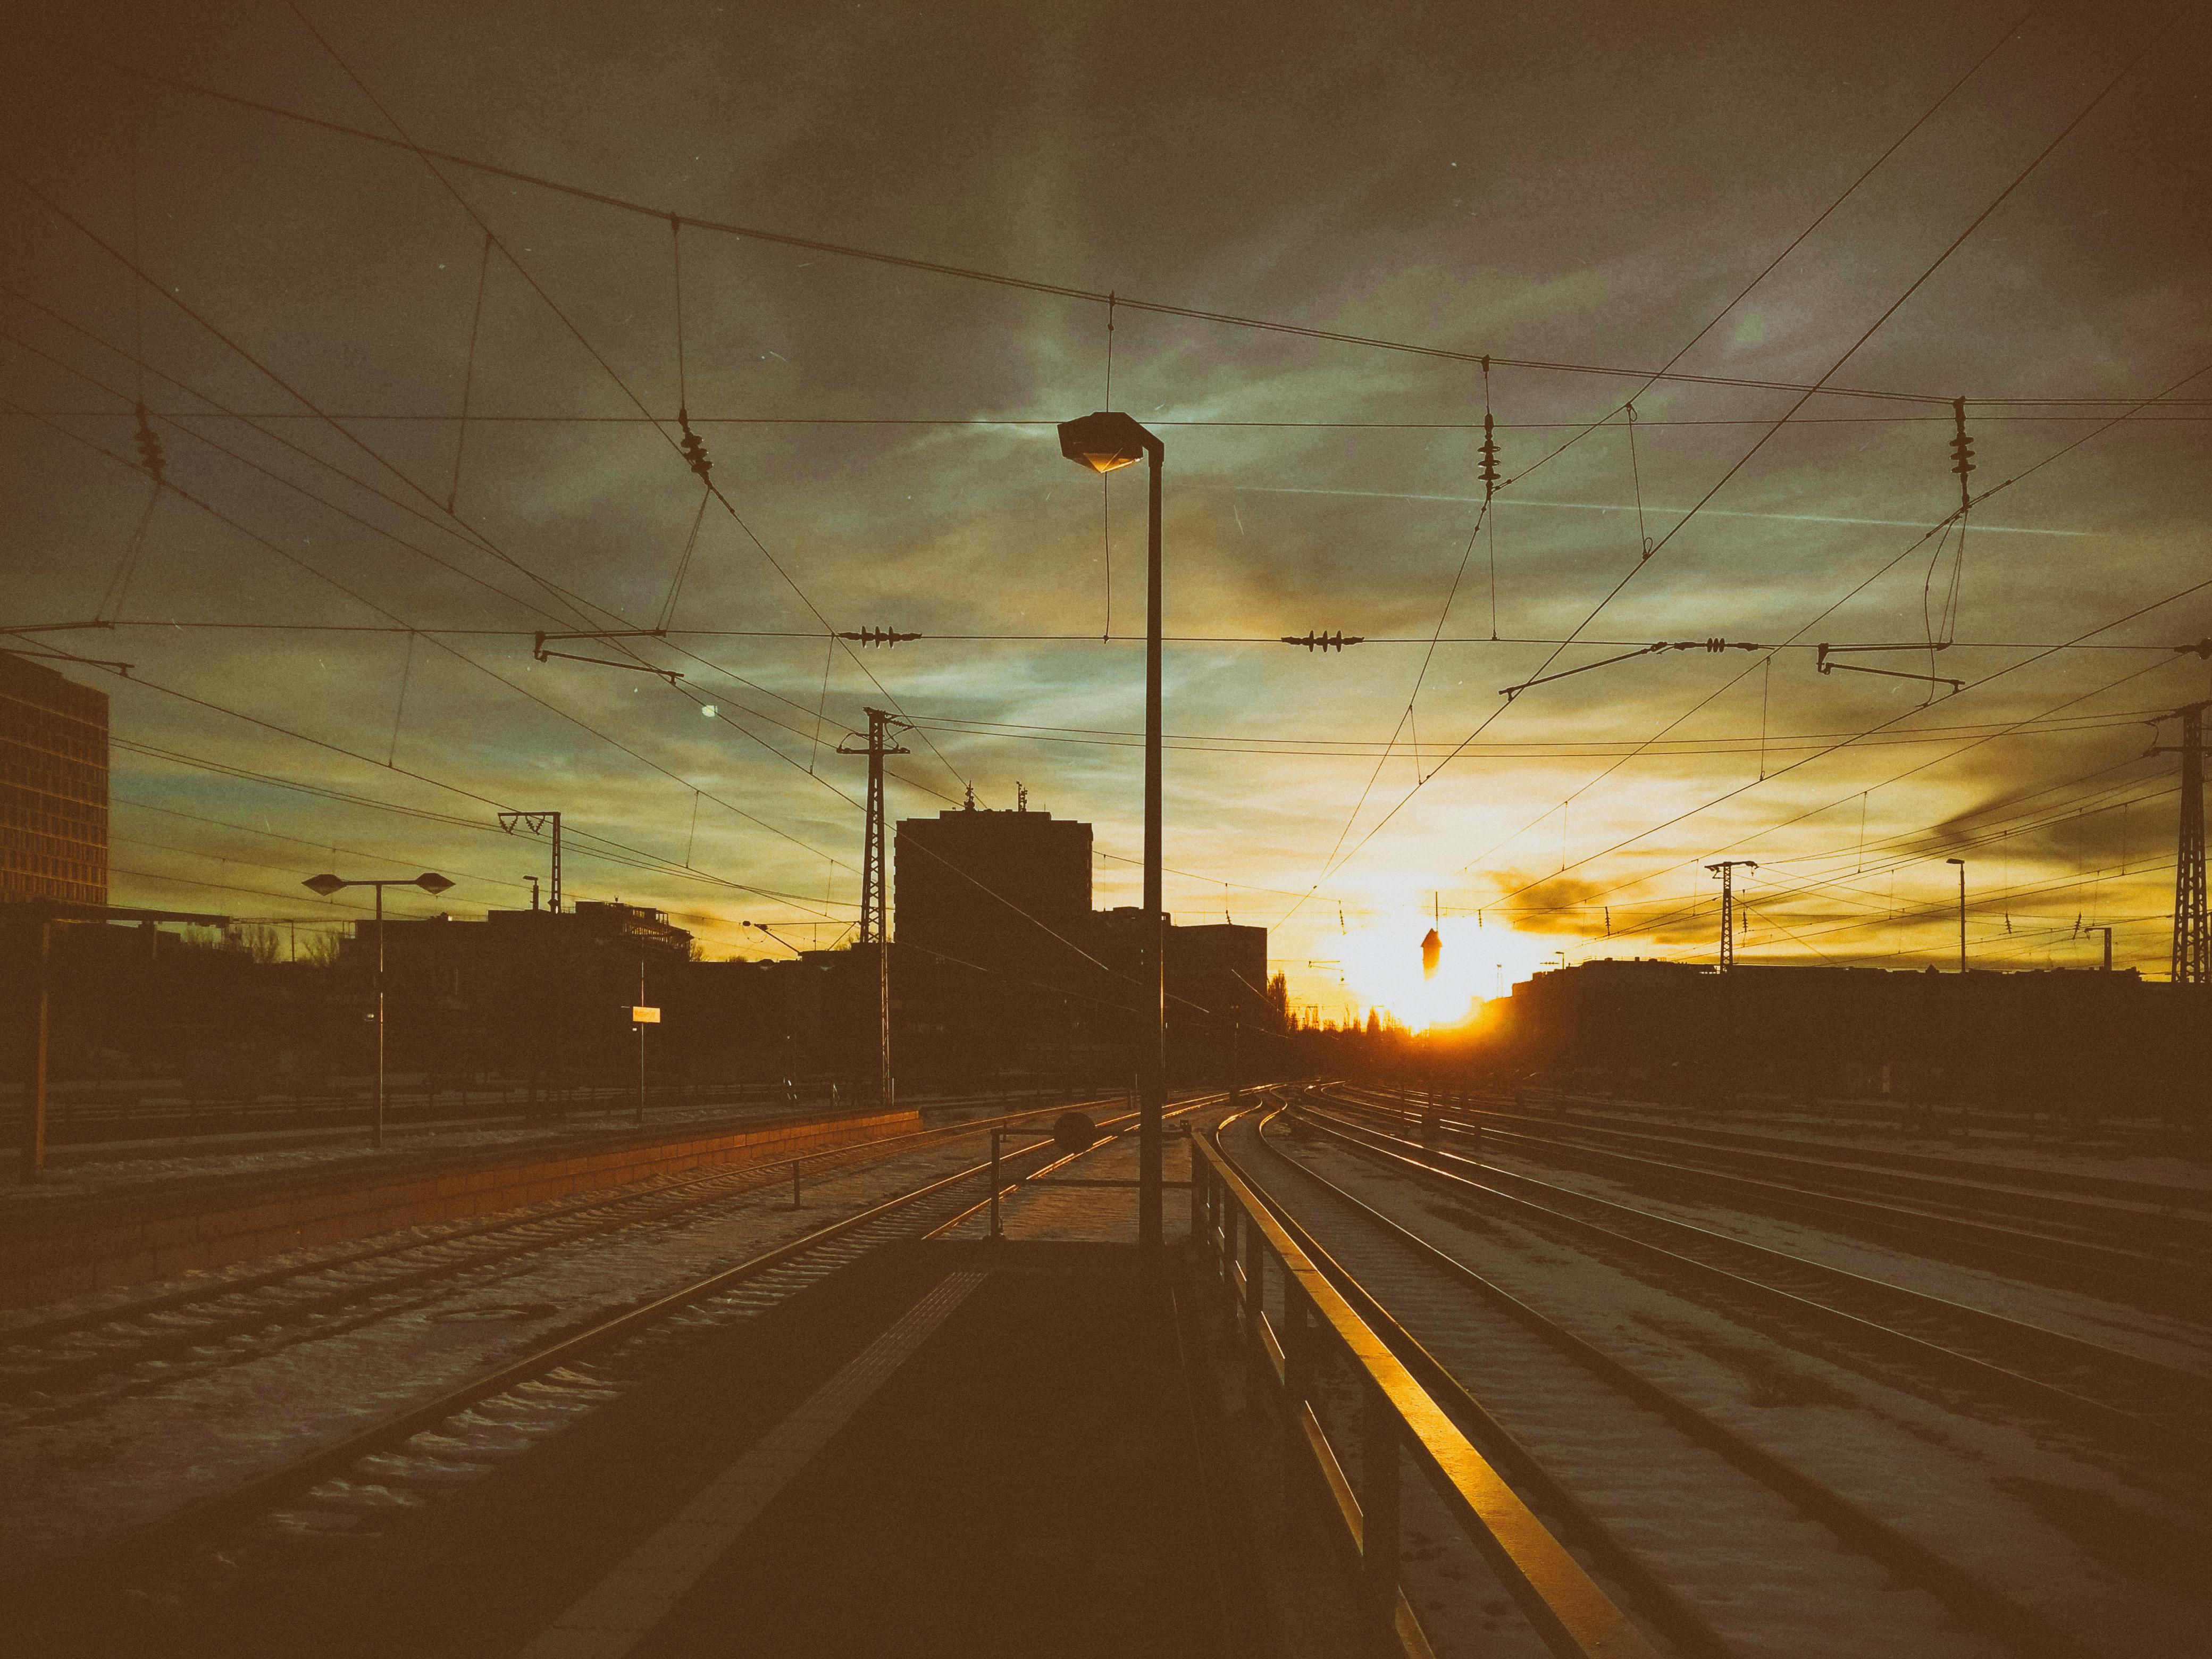 daod - Ostbahnhof